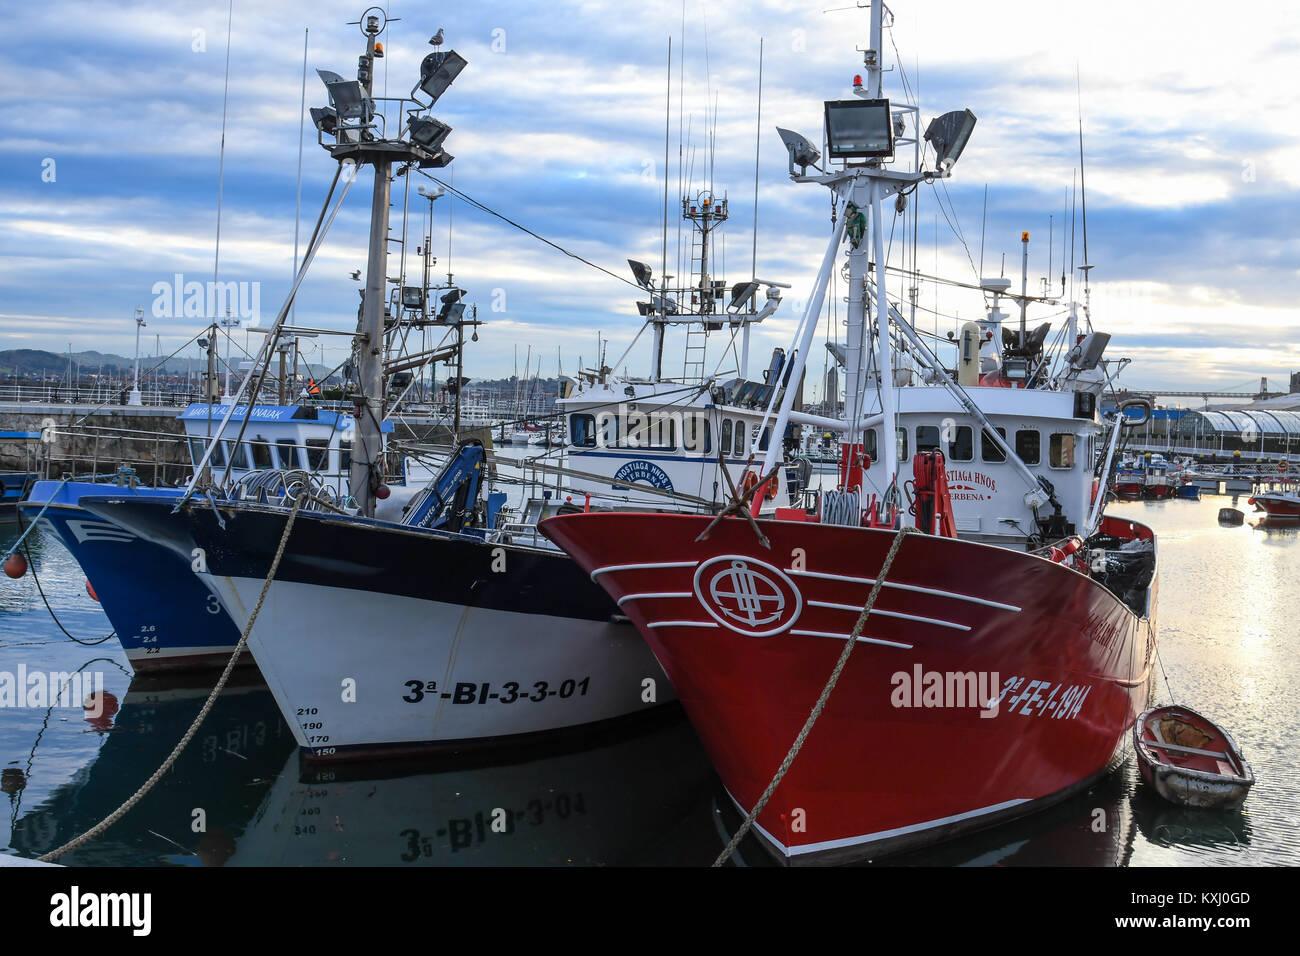 Close-up of fishing boats in the fishing port of Santurtzi Vizcaya - Stock Image